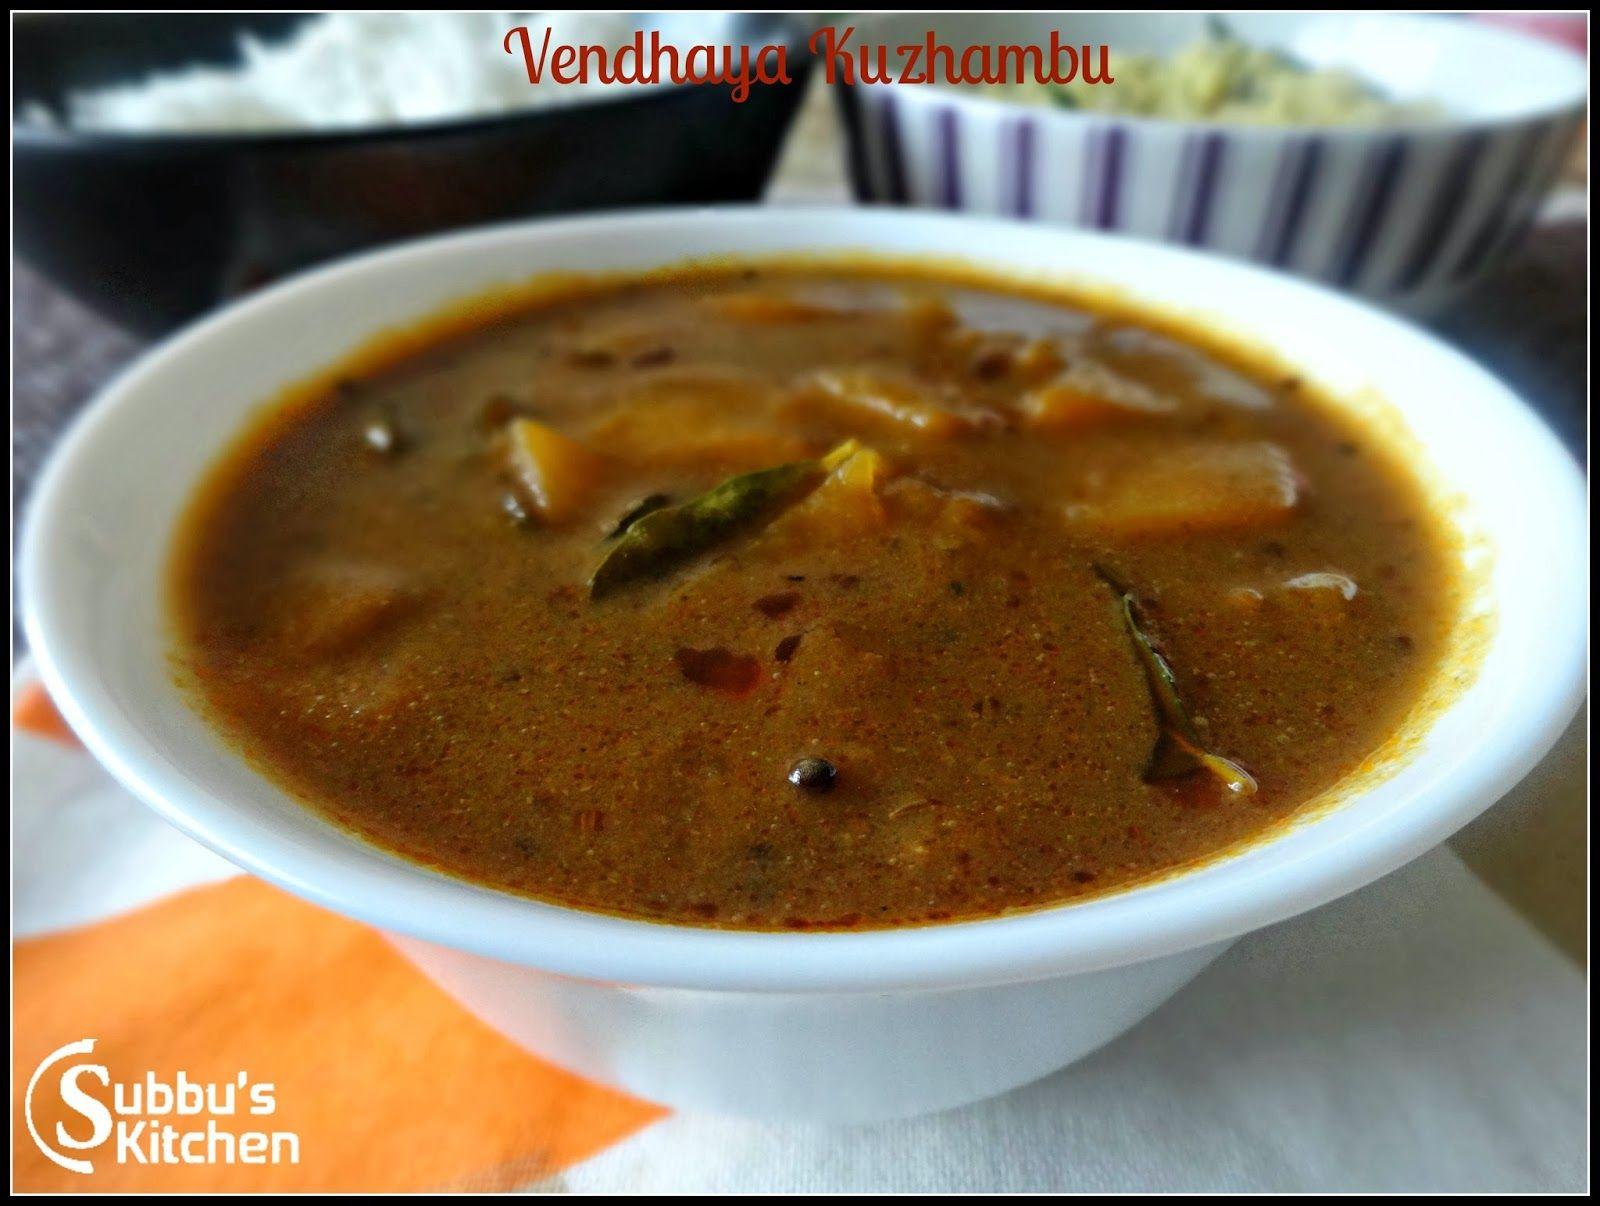 Omam Vendhaya Kuzhambu Indian Food Recipes South Indian Food Vegetarian Recipes